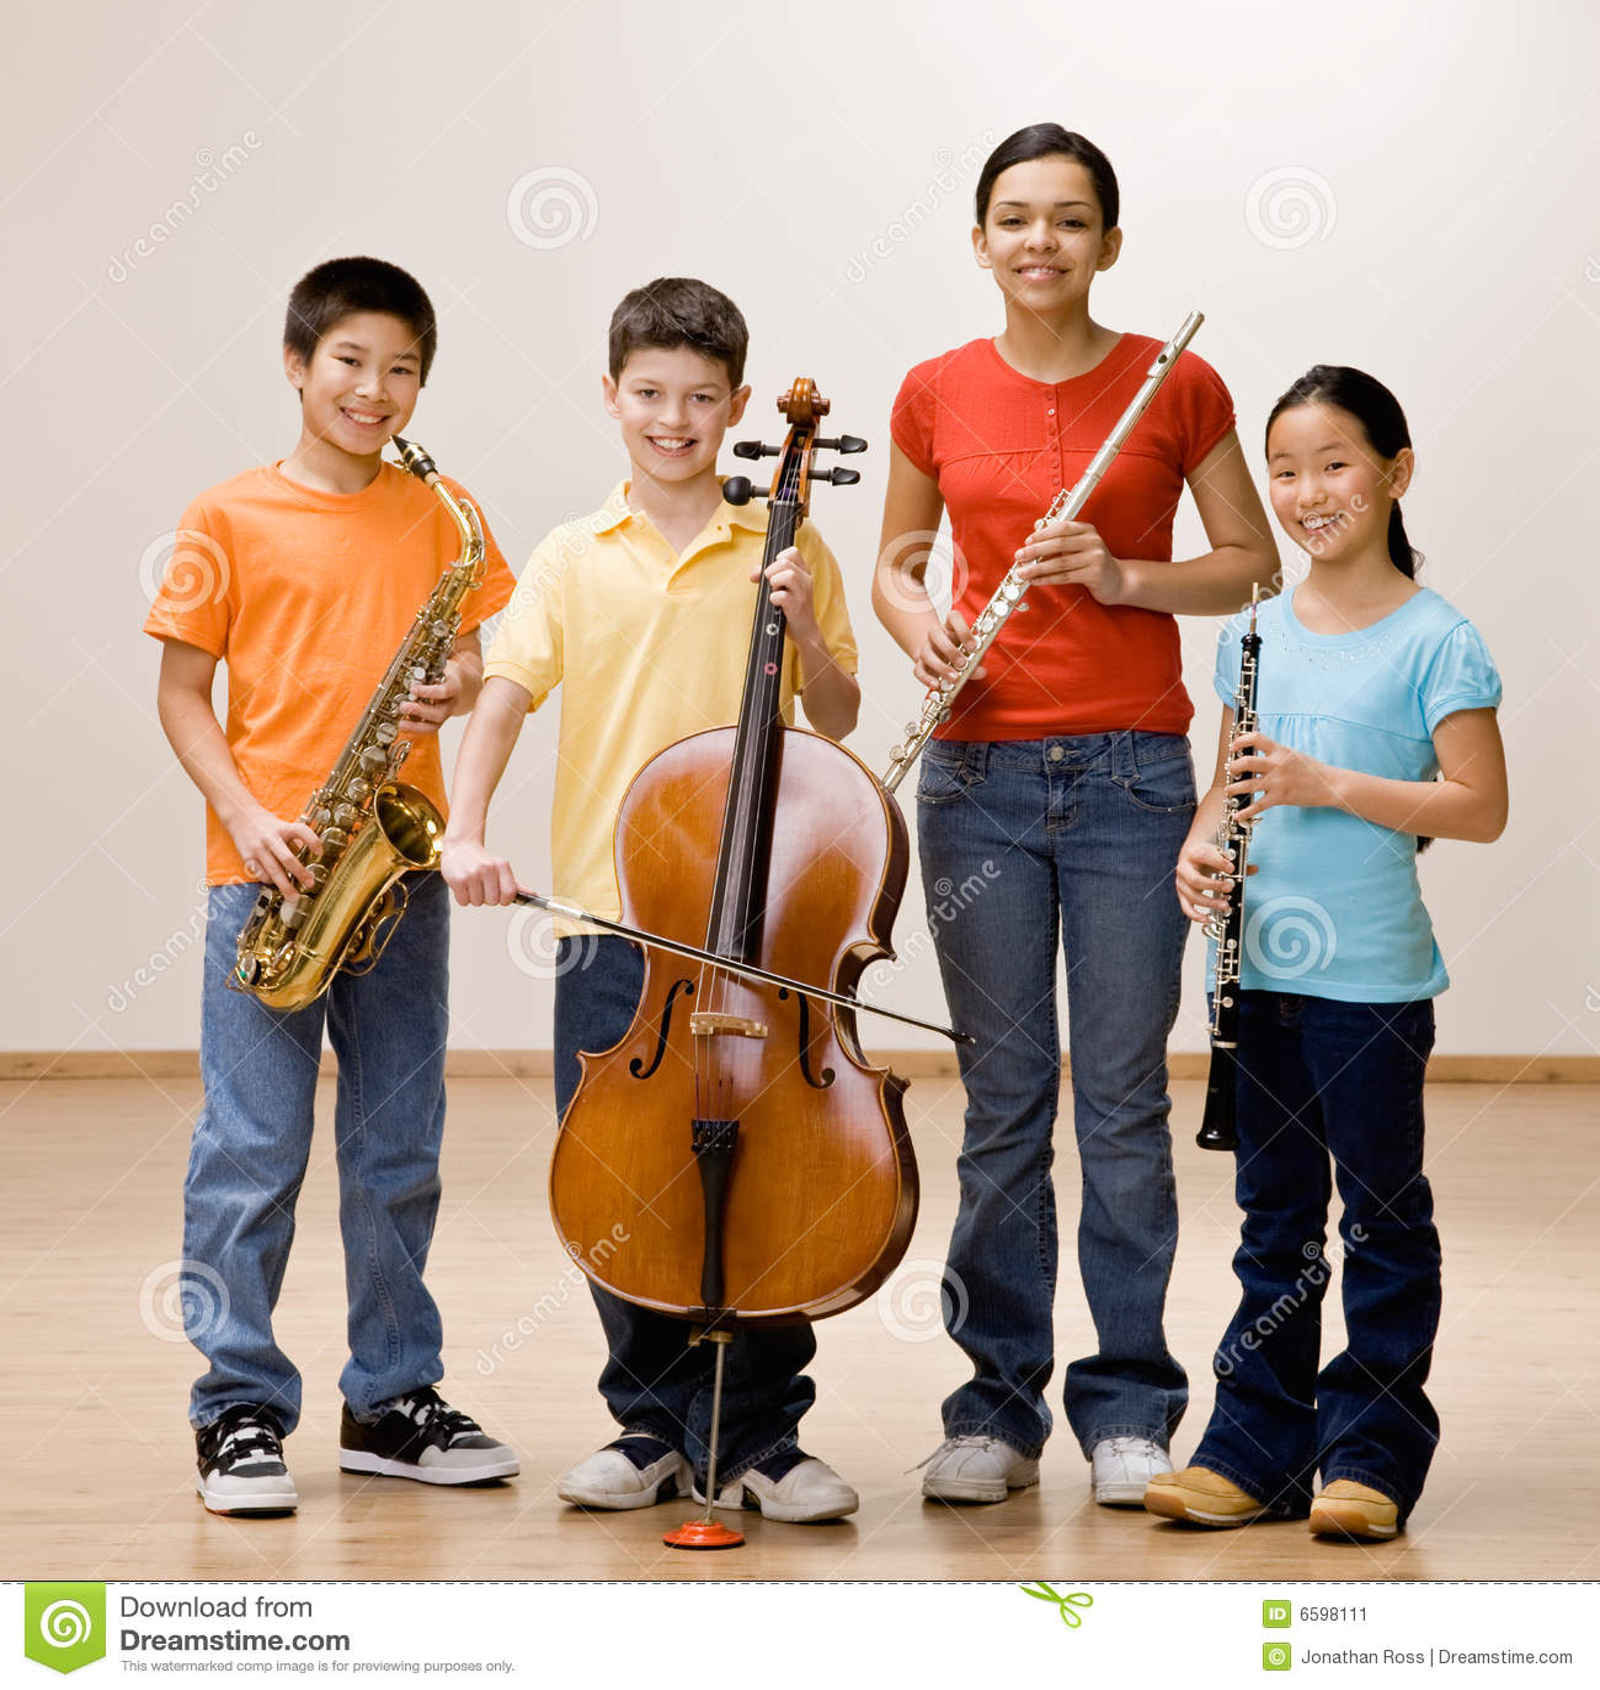 Saxophone κατσικιών εκμετάλλευσης φλαούτων κλαρινέτων βιολοντσέλων